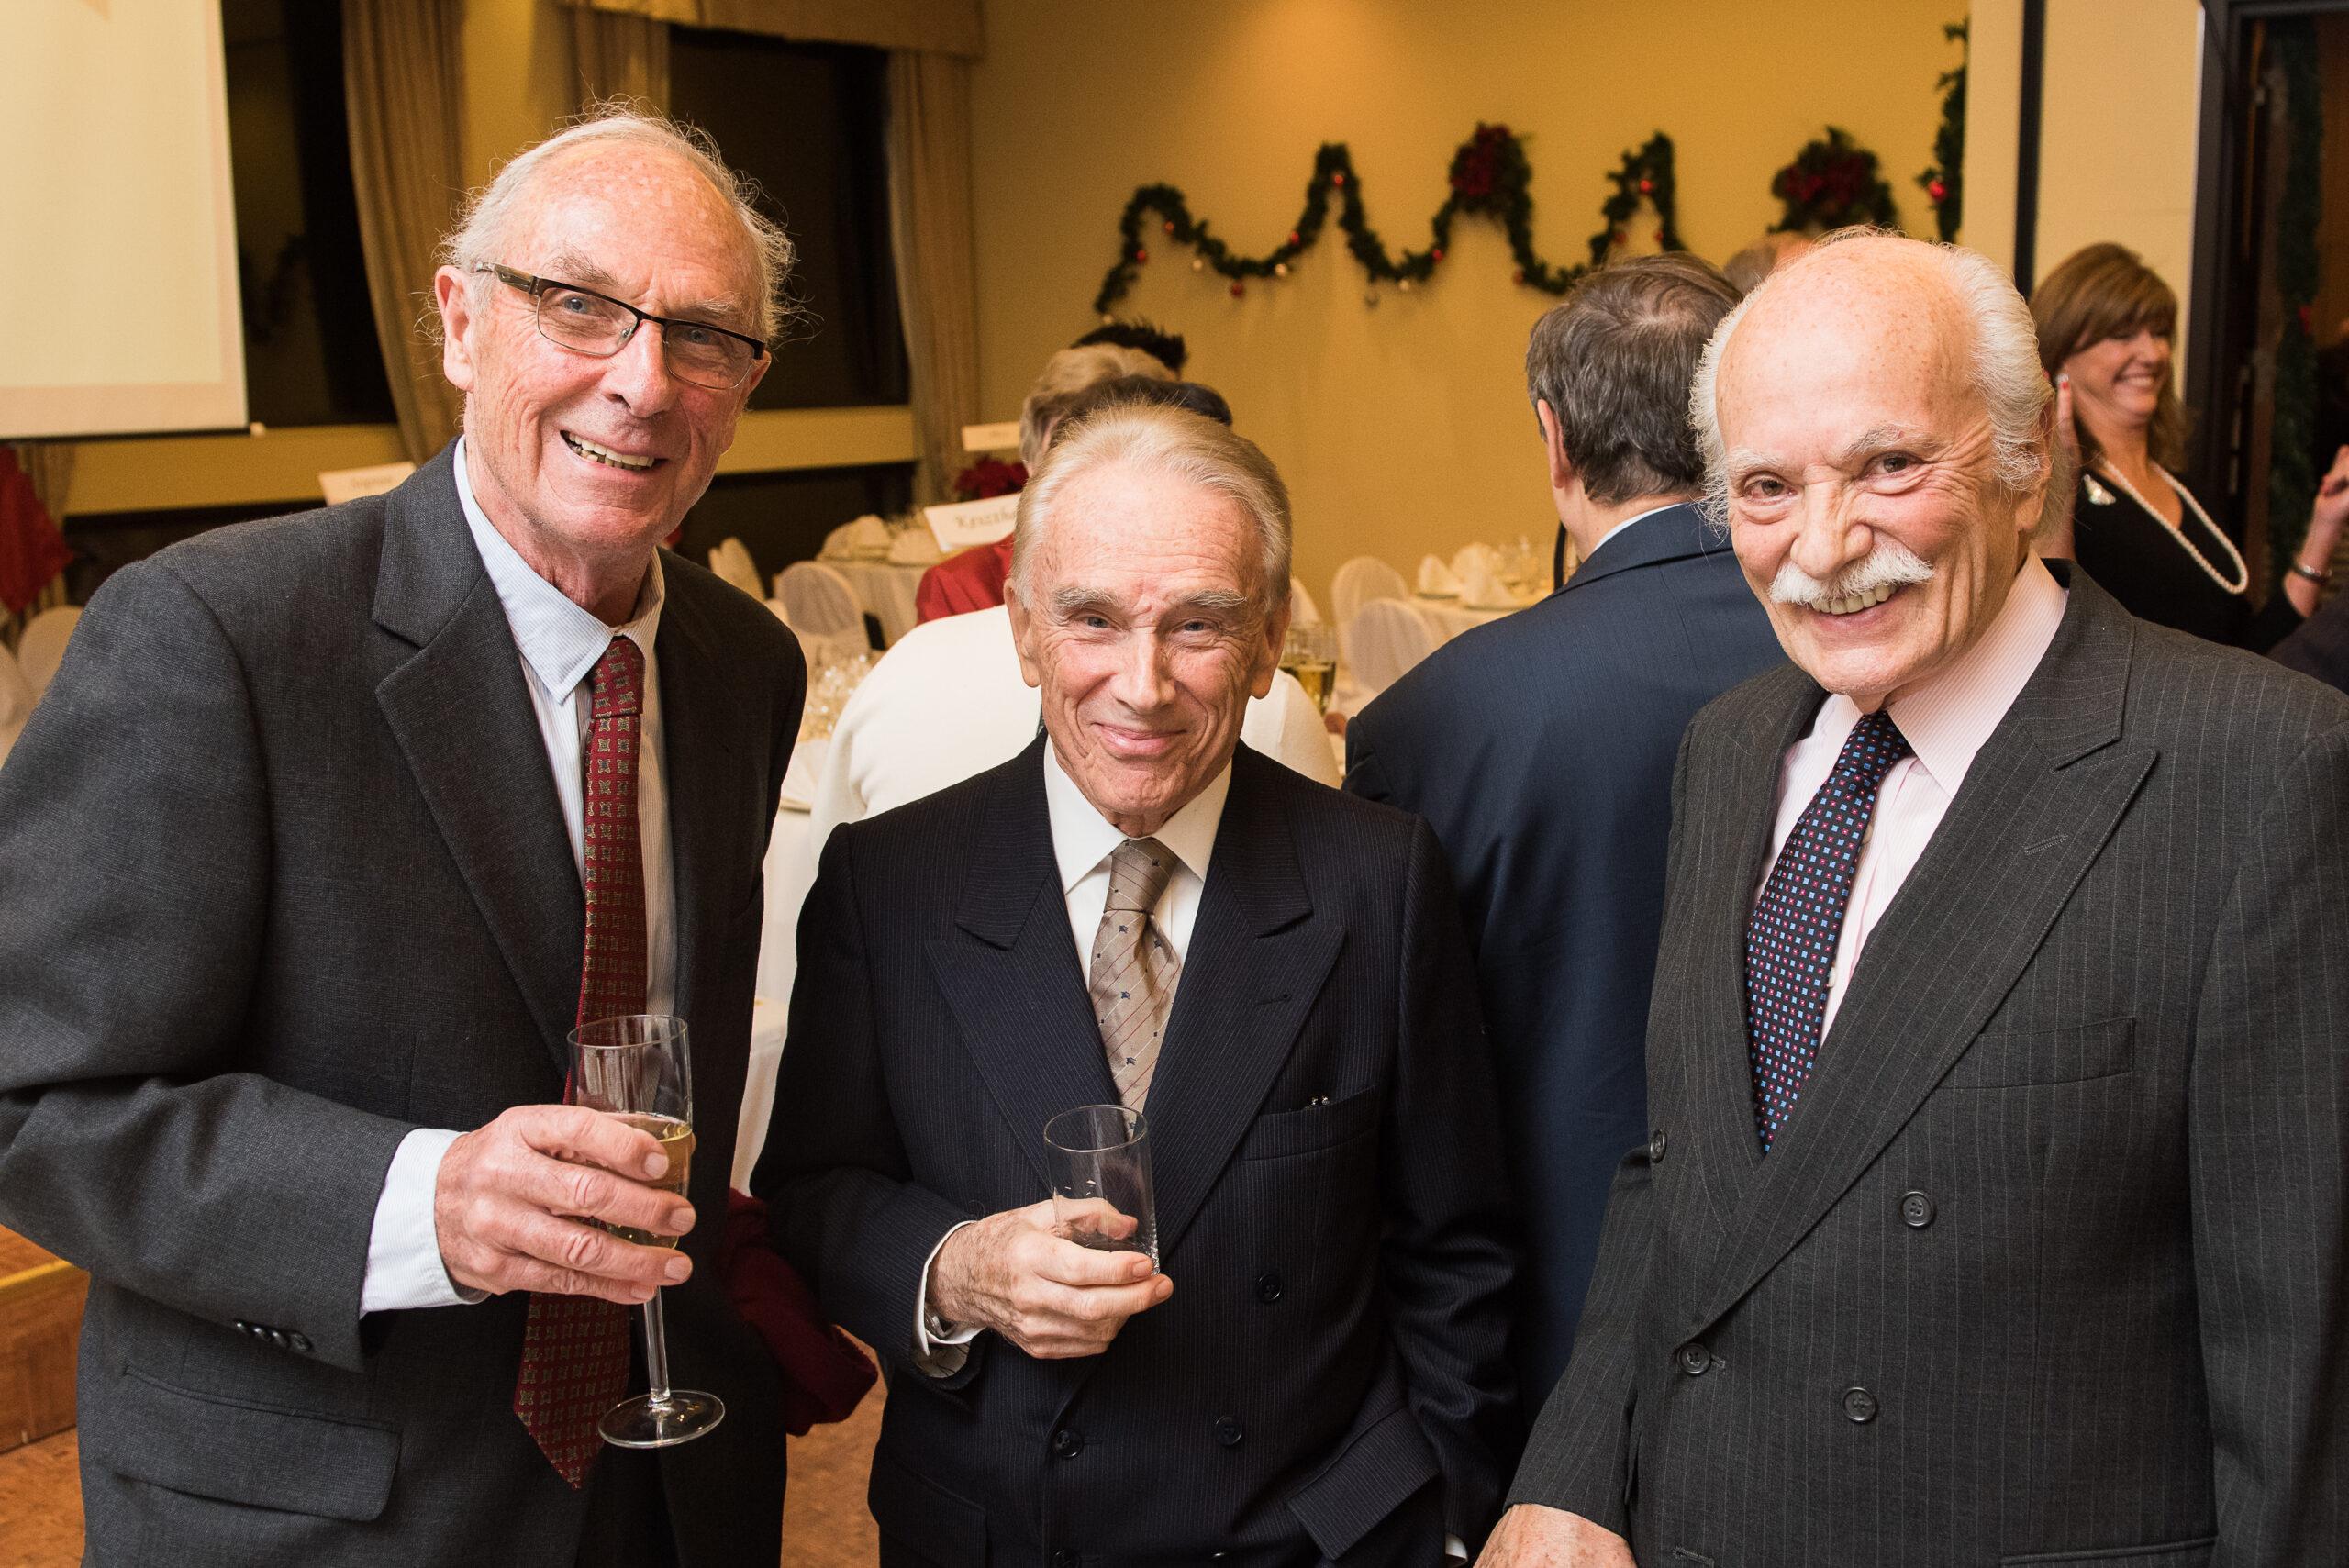 Mr. Sándor Károlyi, Mr. Julius Várallyay, Mr. Steven Teleki